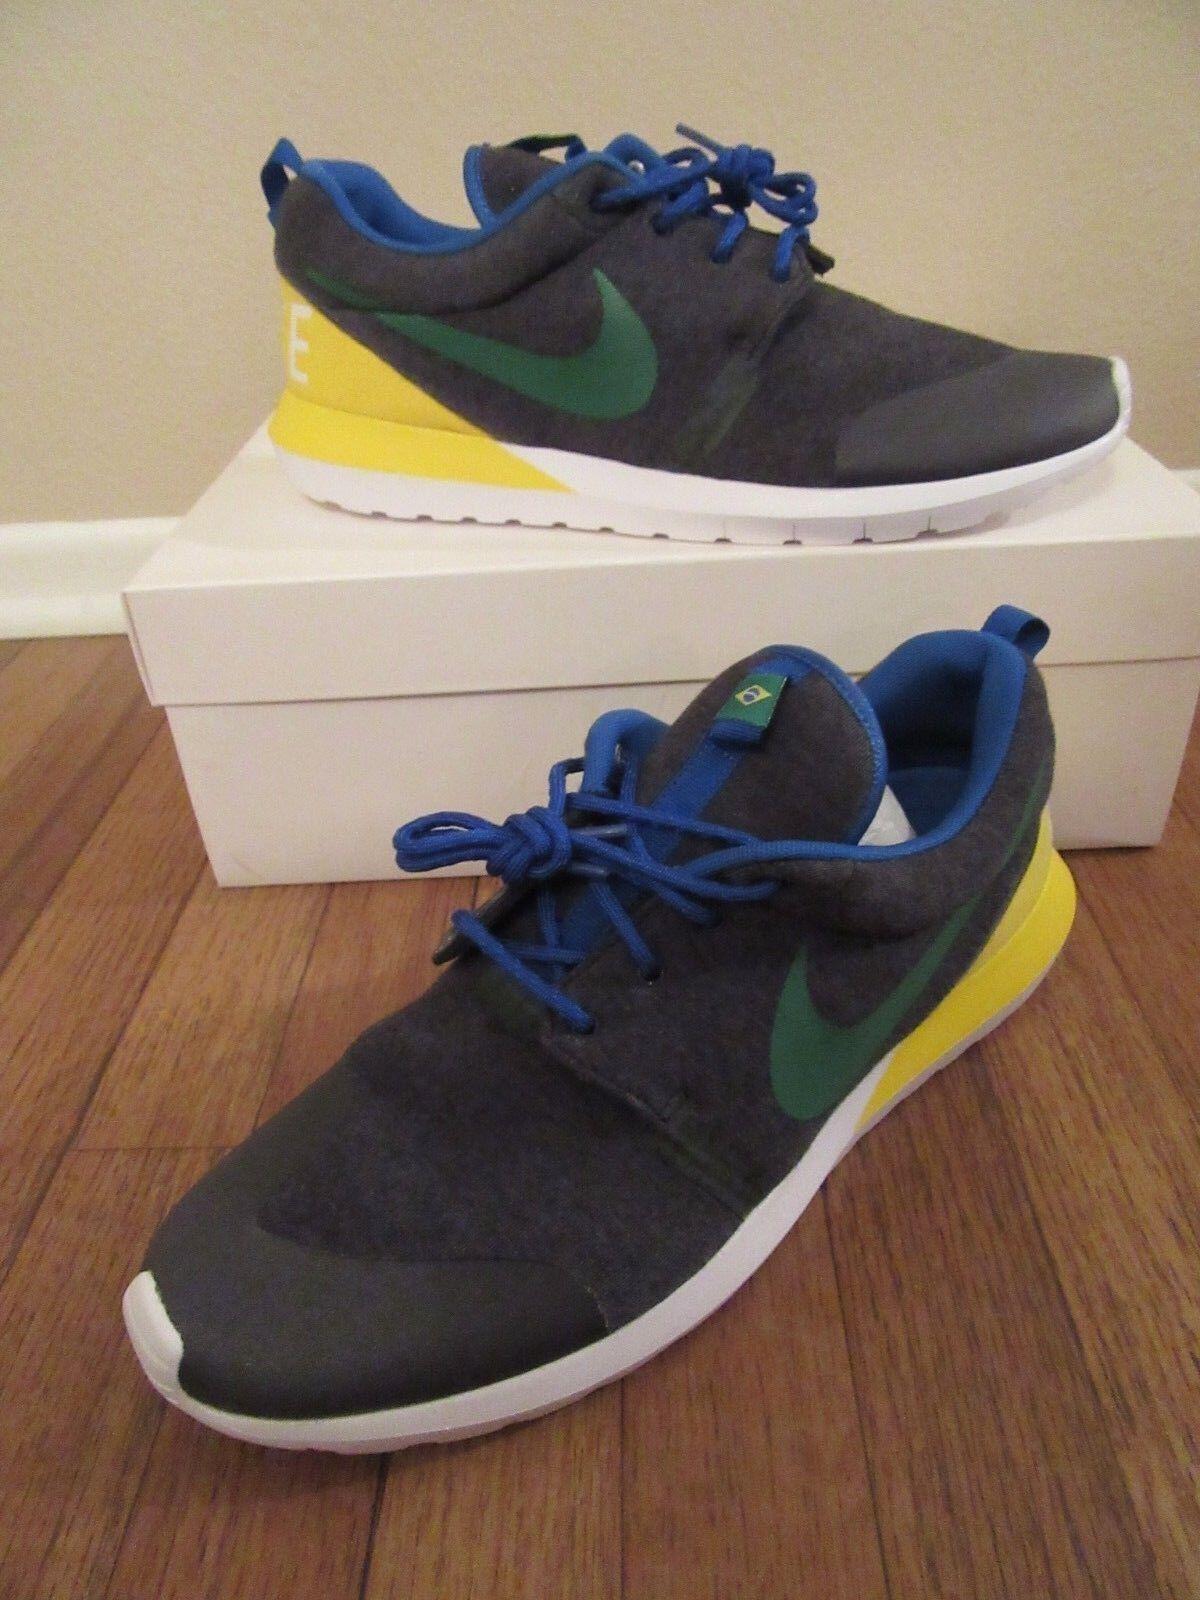 Nike Rosherun NM W SP Size 12 Brazil Black Heather Green Yellow 652804 037 NIB